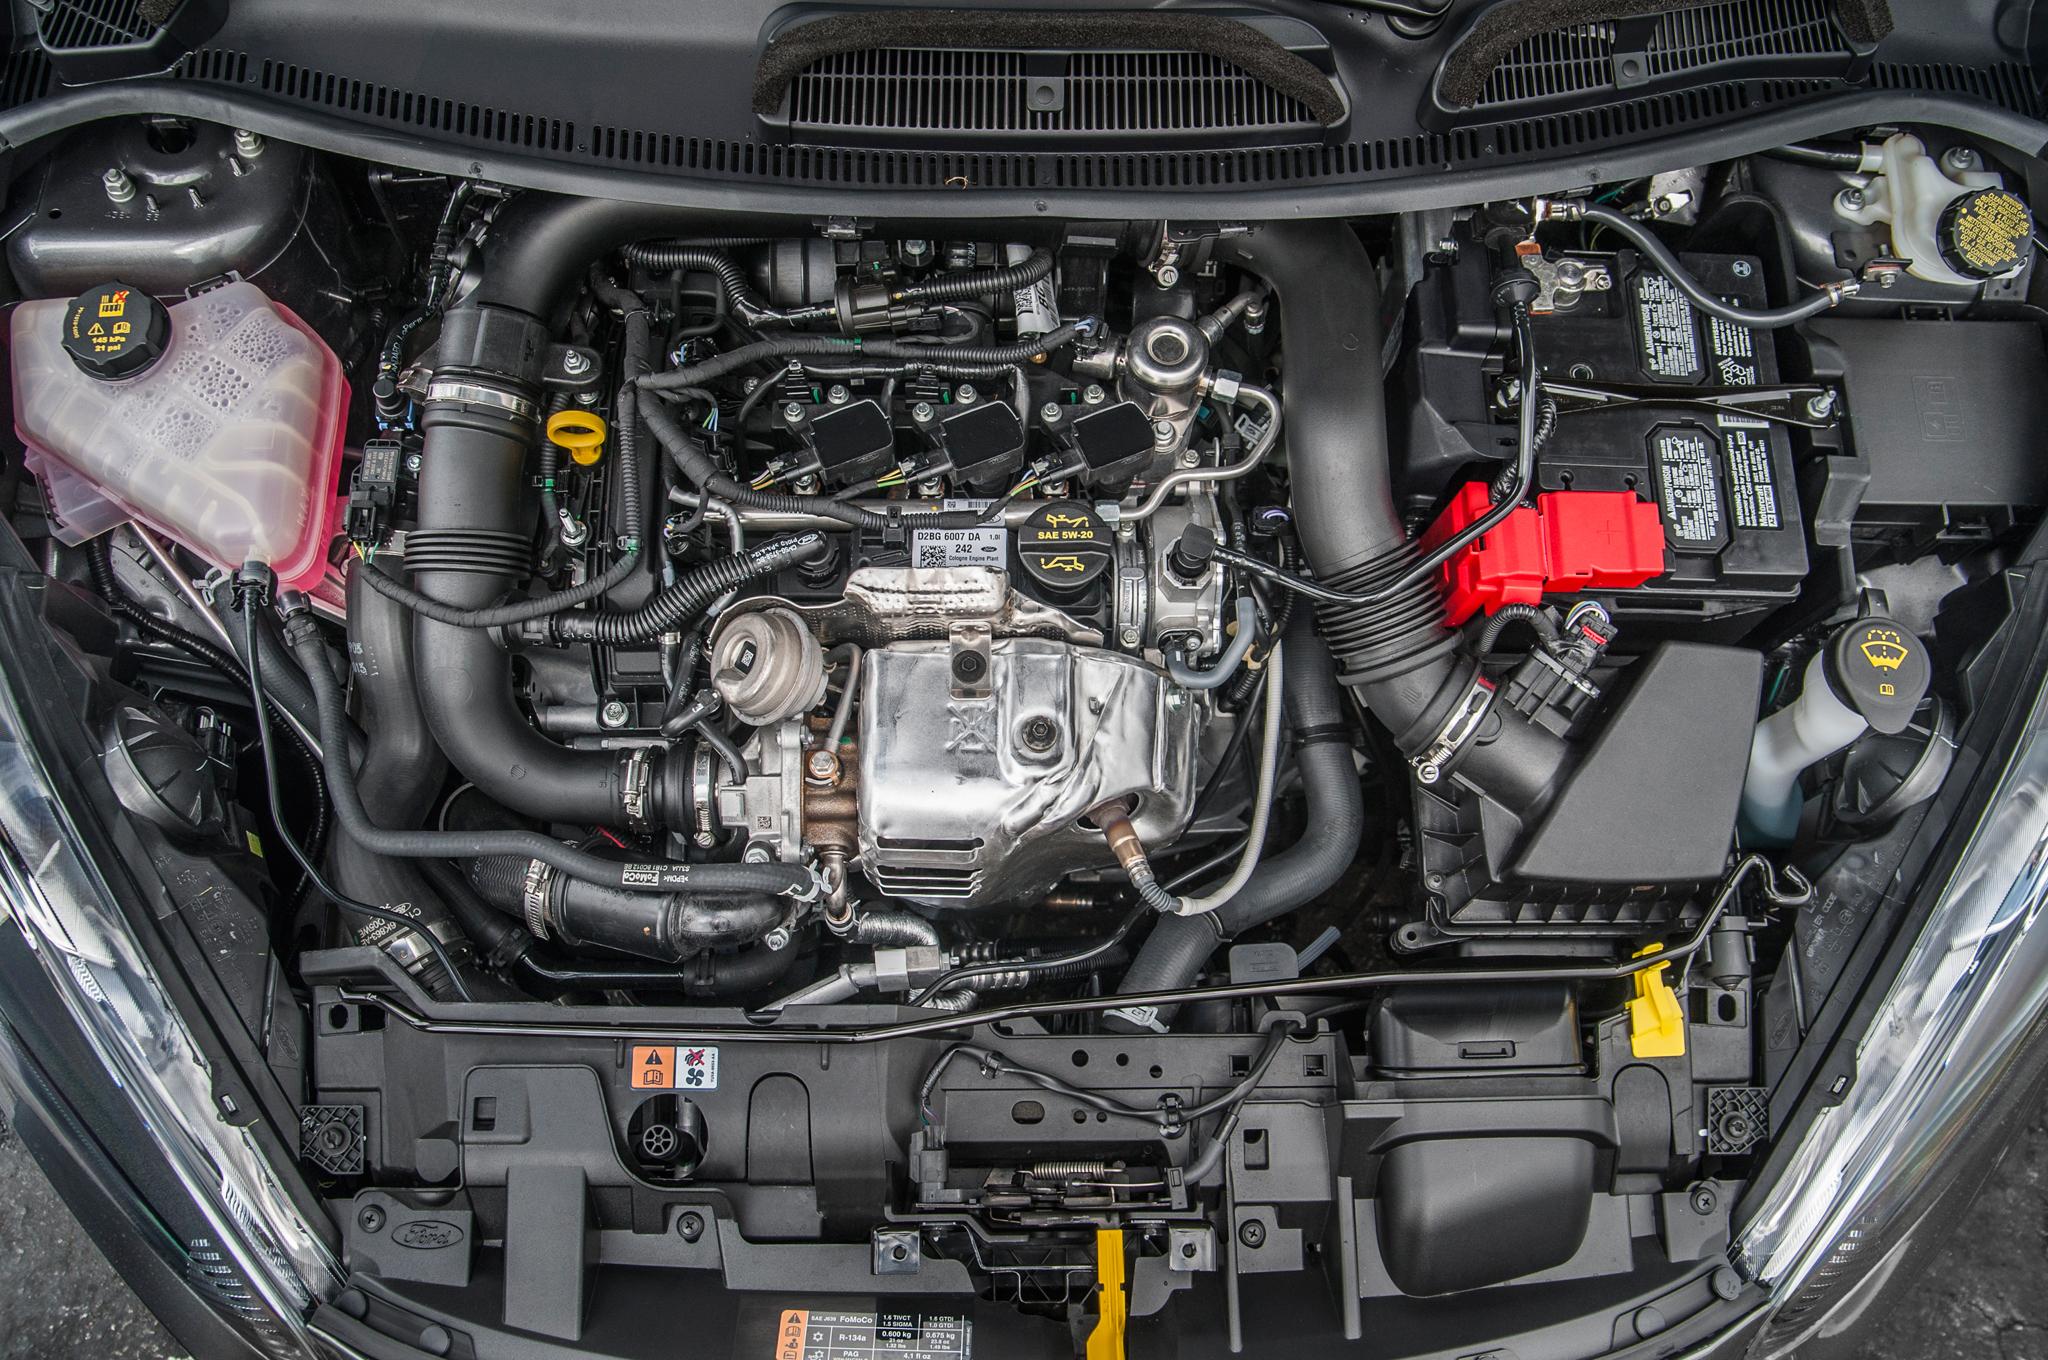 Ford Fiesta Engine Size Car Reviews 2018 2013 Diagram Head To Honda Jazz 1 3 Vs 0 Ecoboost Carsomesg